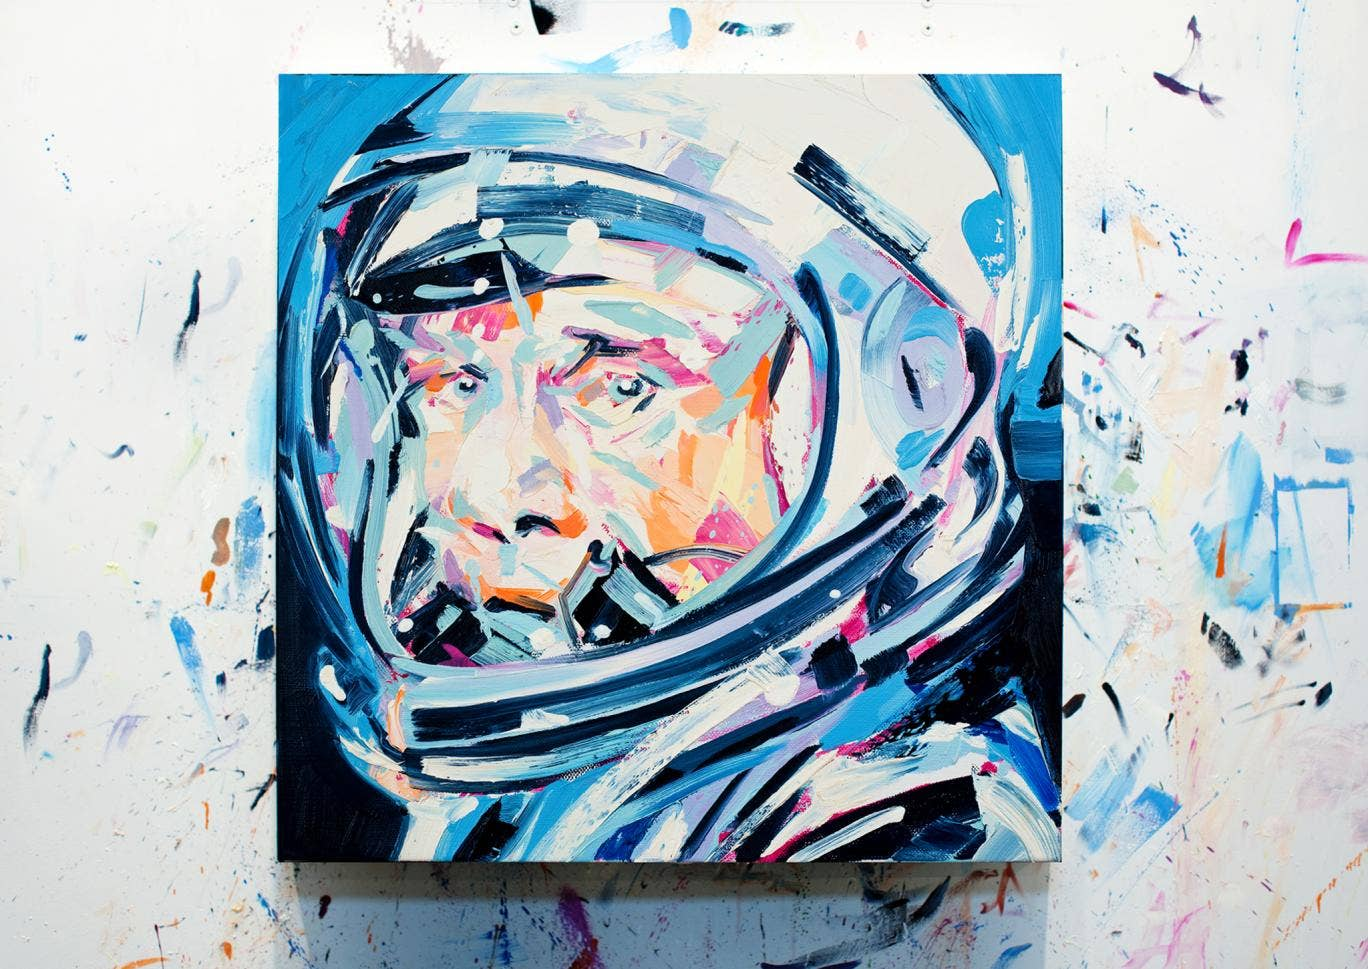 Michael Kagan's oil painting 'Pilot 2' for White Lies' album cover